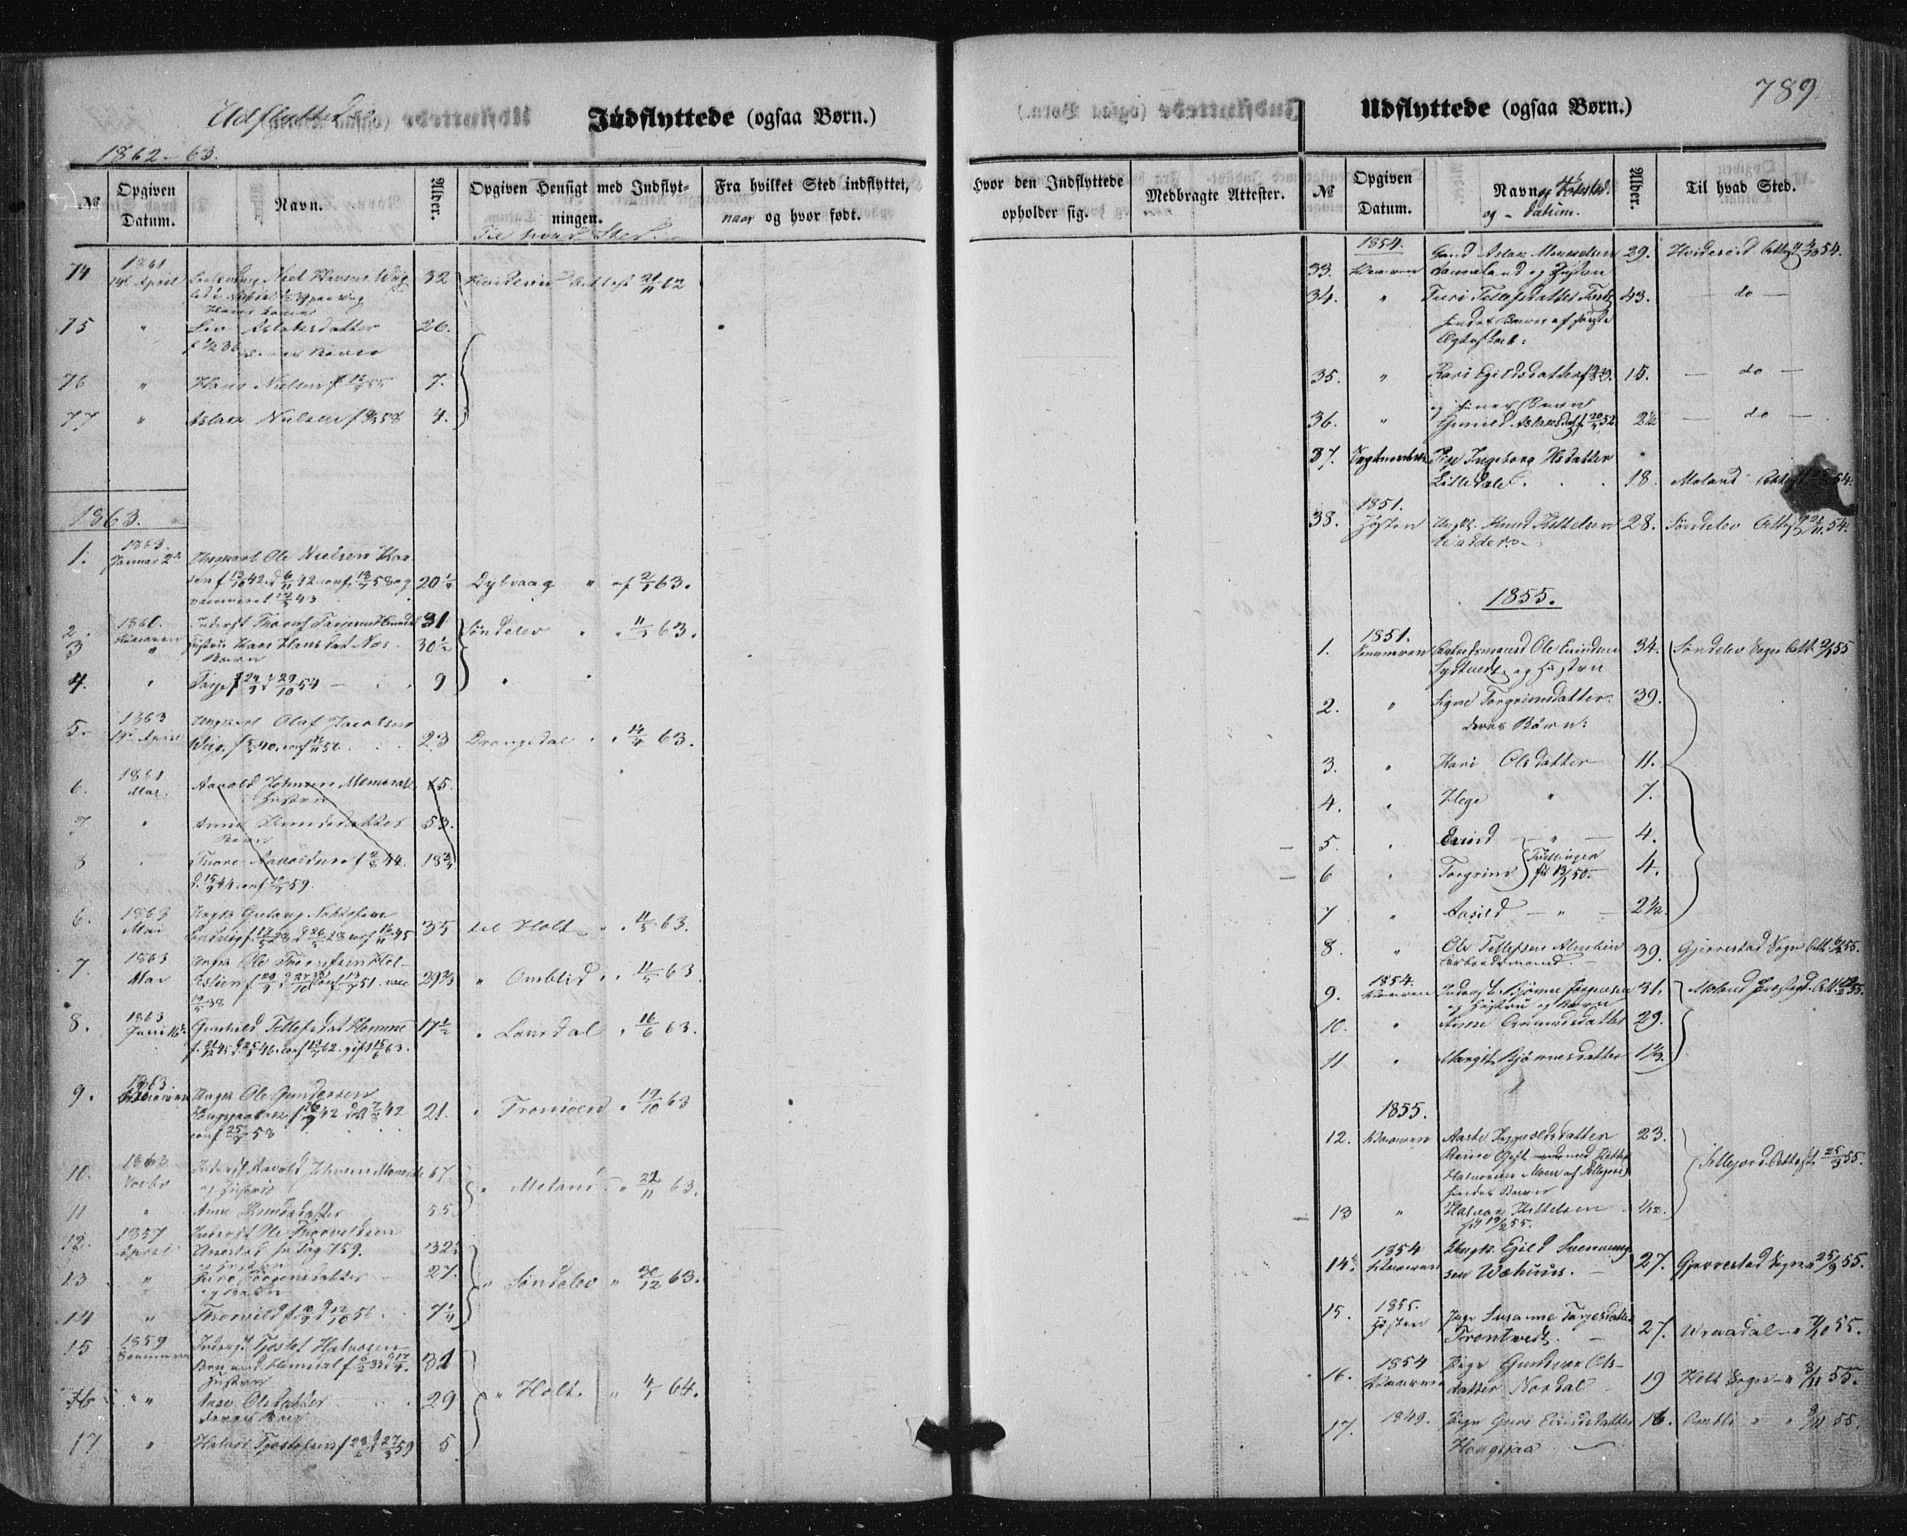 SAKO, Nissedal kirkebøker, F/Fa/L0003: Ministerialbok nr. I 3, 1846-1870, s. 788-789